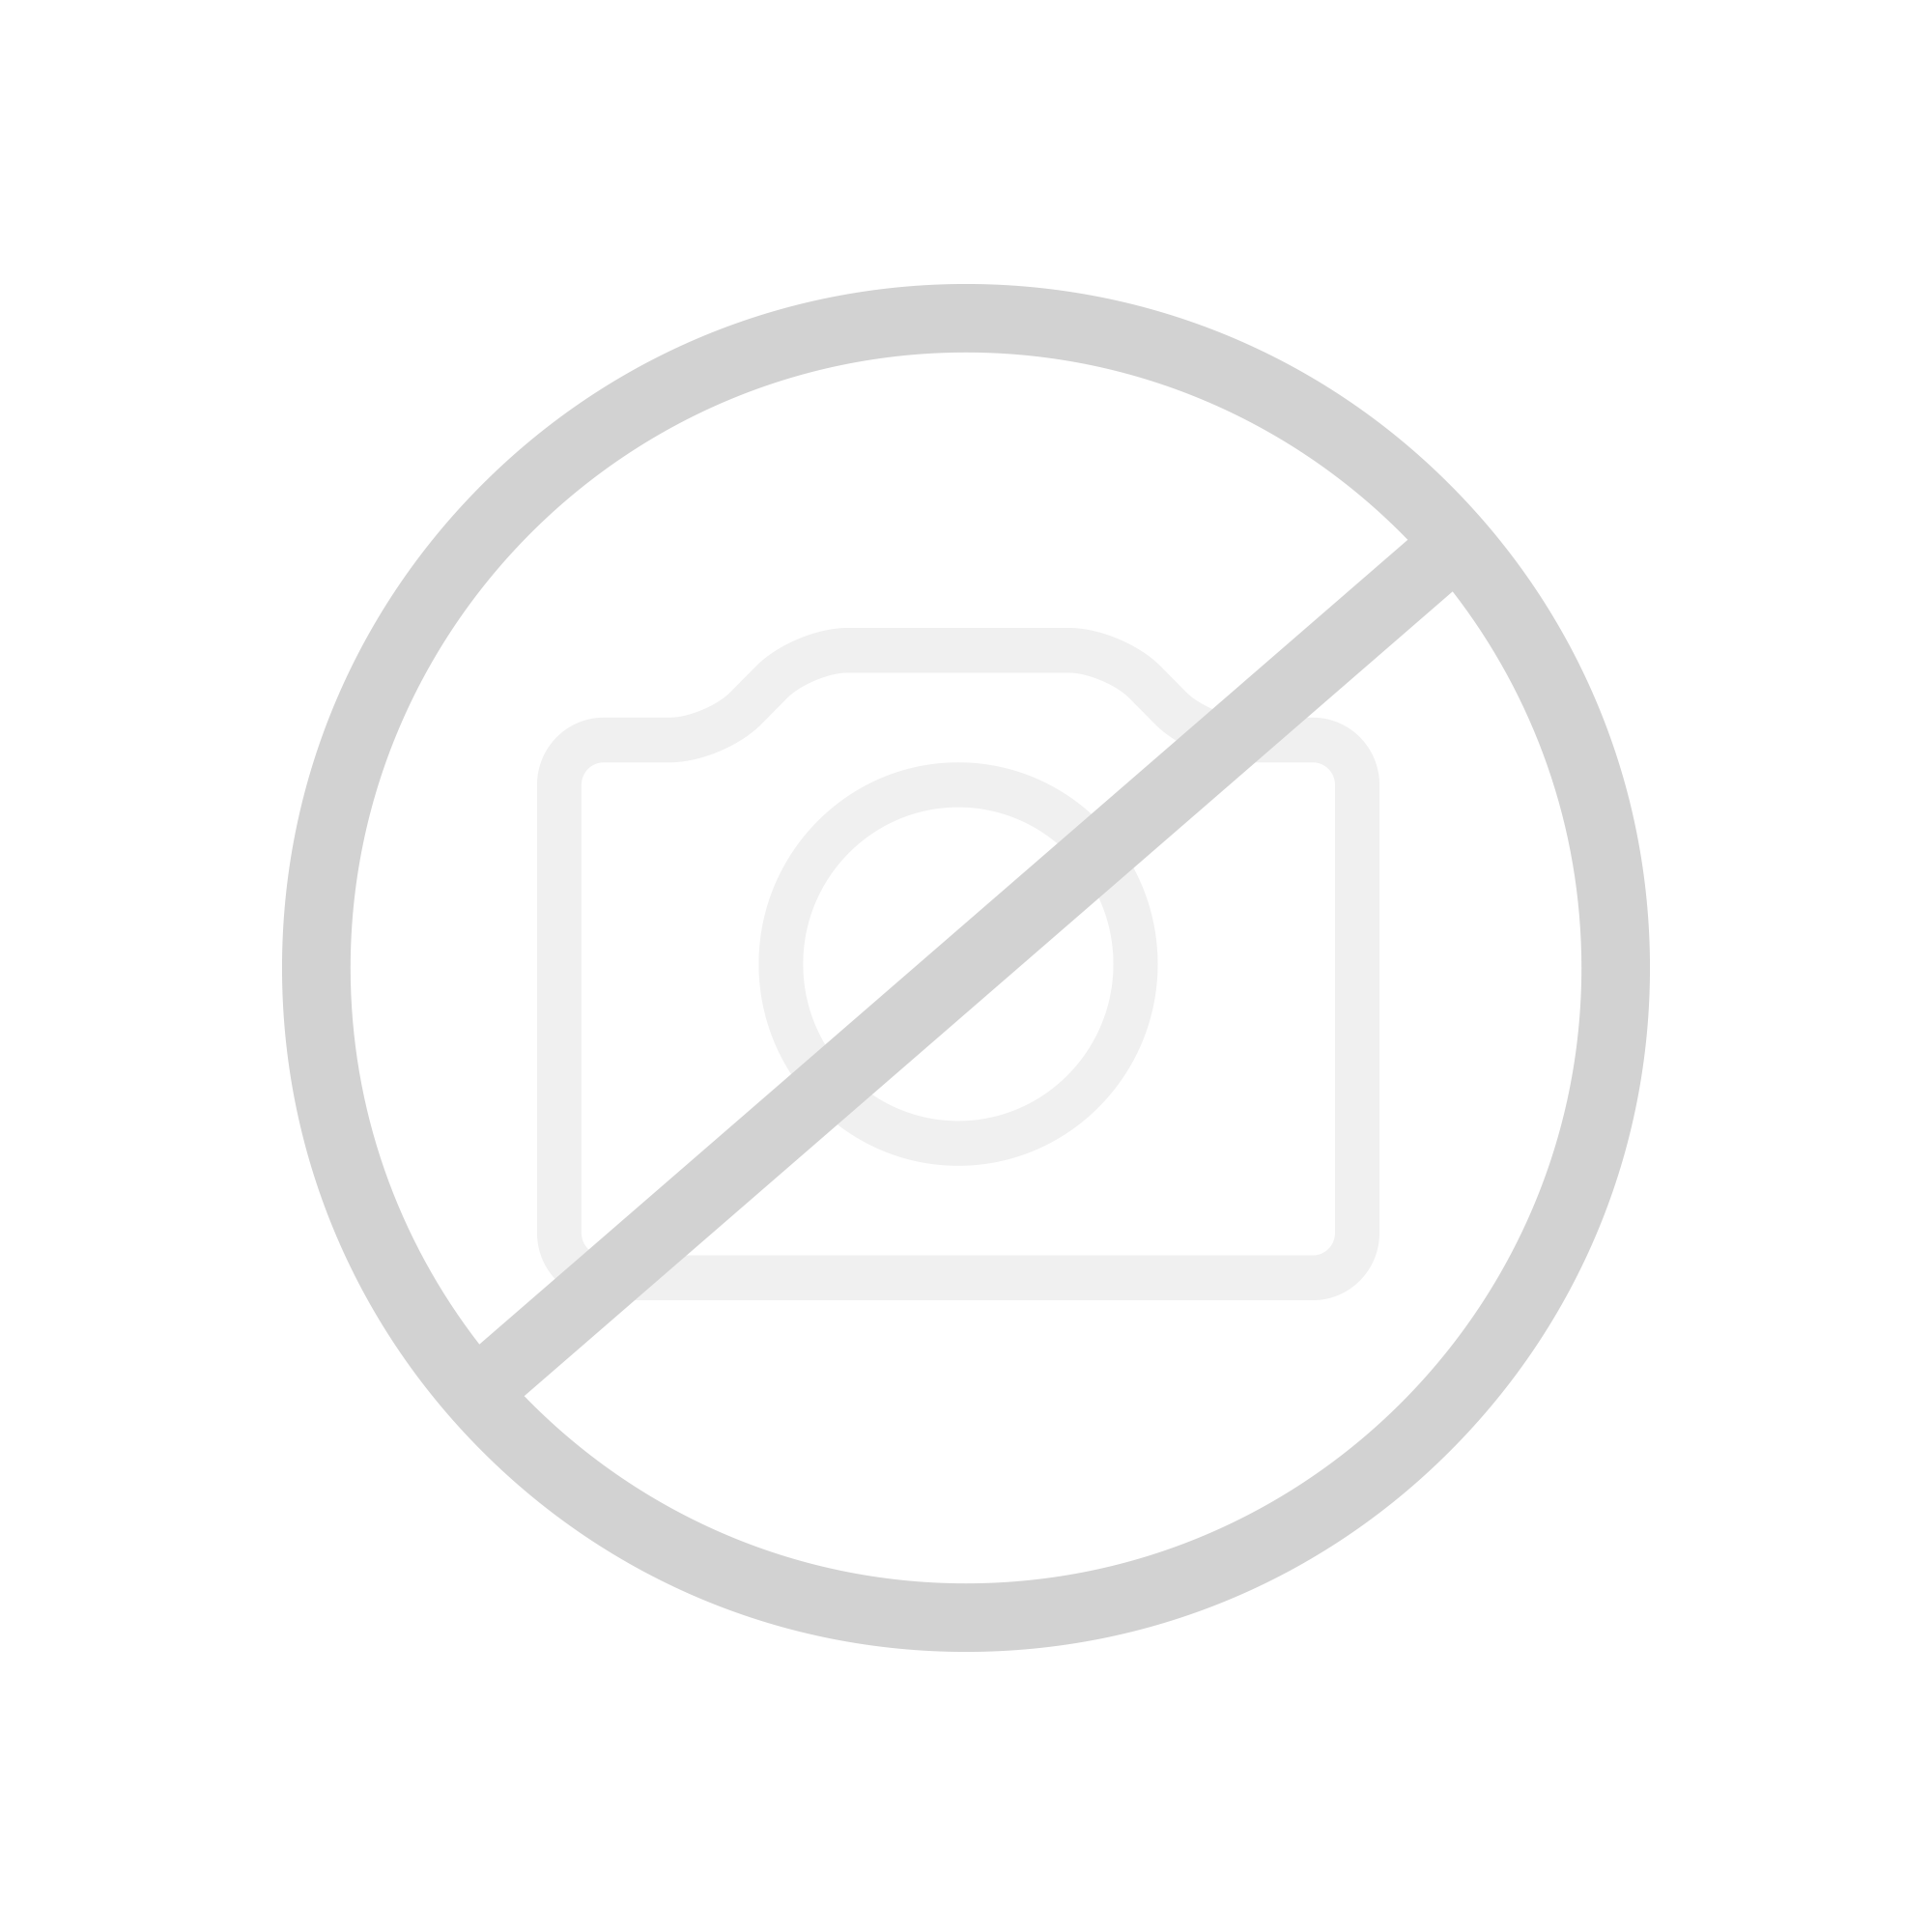 geberit 200f bet tigungsplatte f r sp l stopp ausl sung wei 115222111 reuter onlineshop. Black Bedroom Furniture Sets. Home Design Ideas